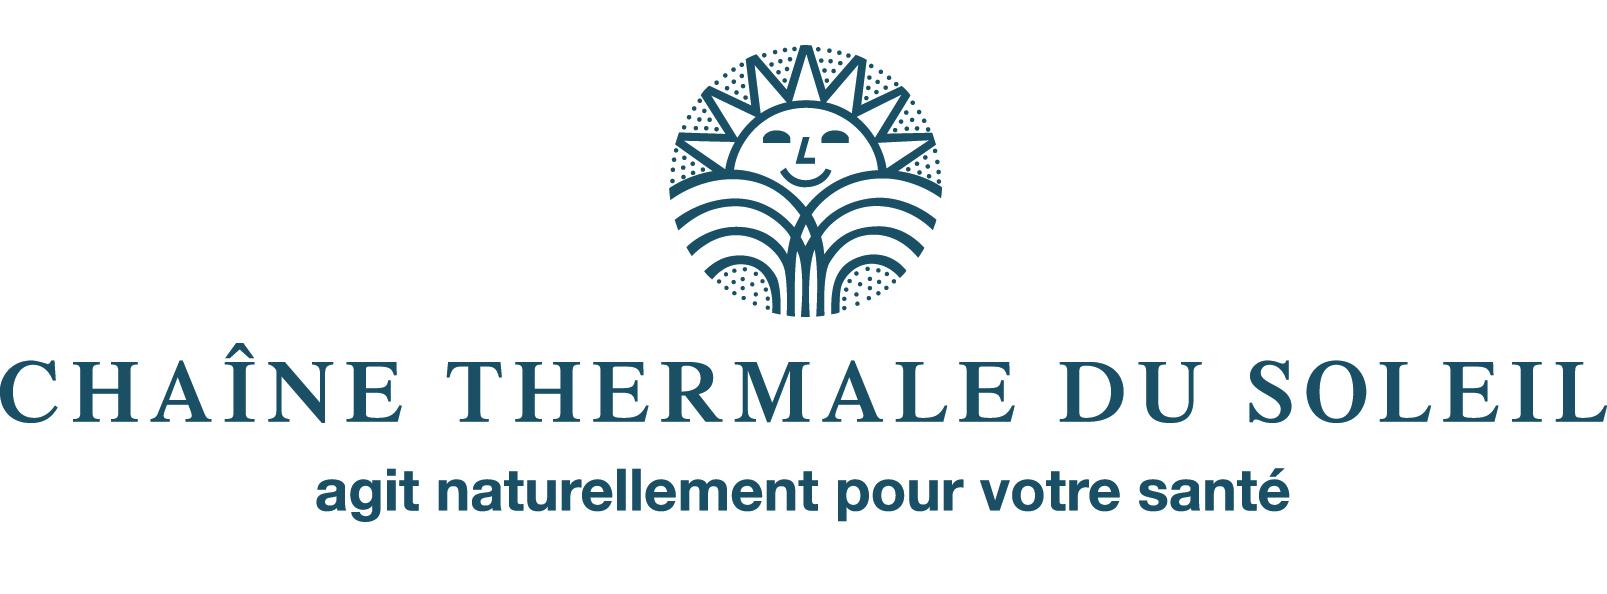 NYh5q7oEn1hIQaDz6Awk_CTS_Logo_bleu_accroche_gras.jpg